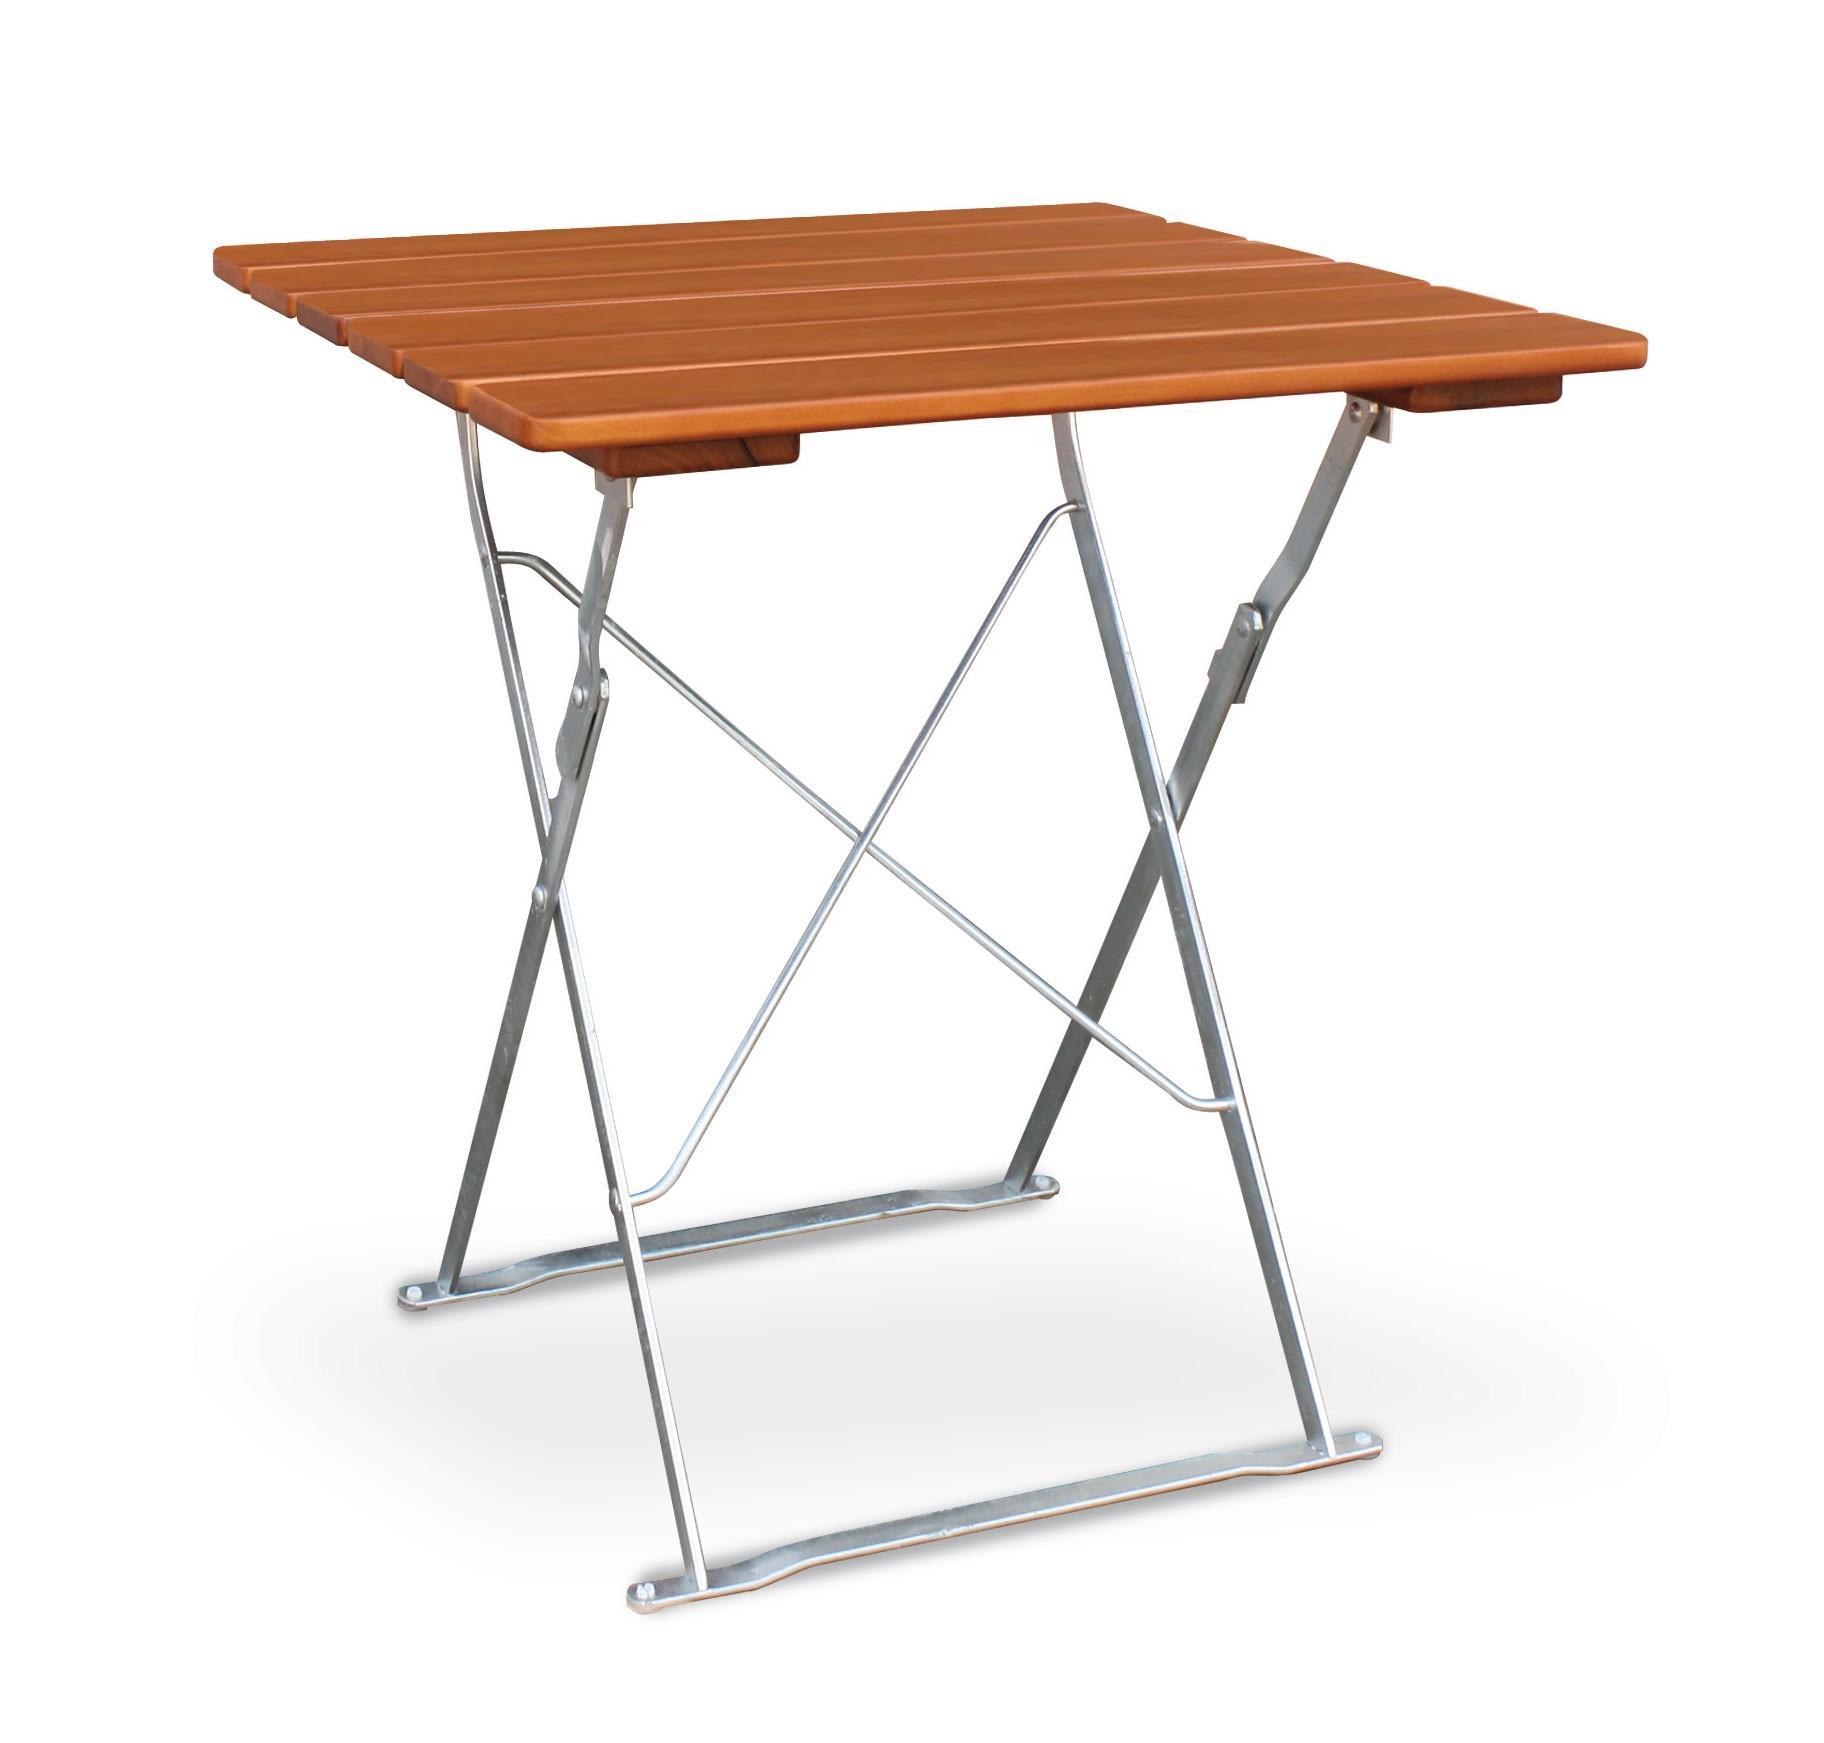 Gartentisch / Biergartentisch klappbar Classic 70 x70cm ocker/verzinkt Bild 1